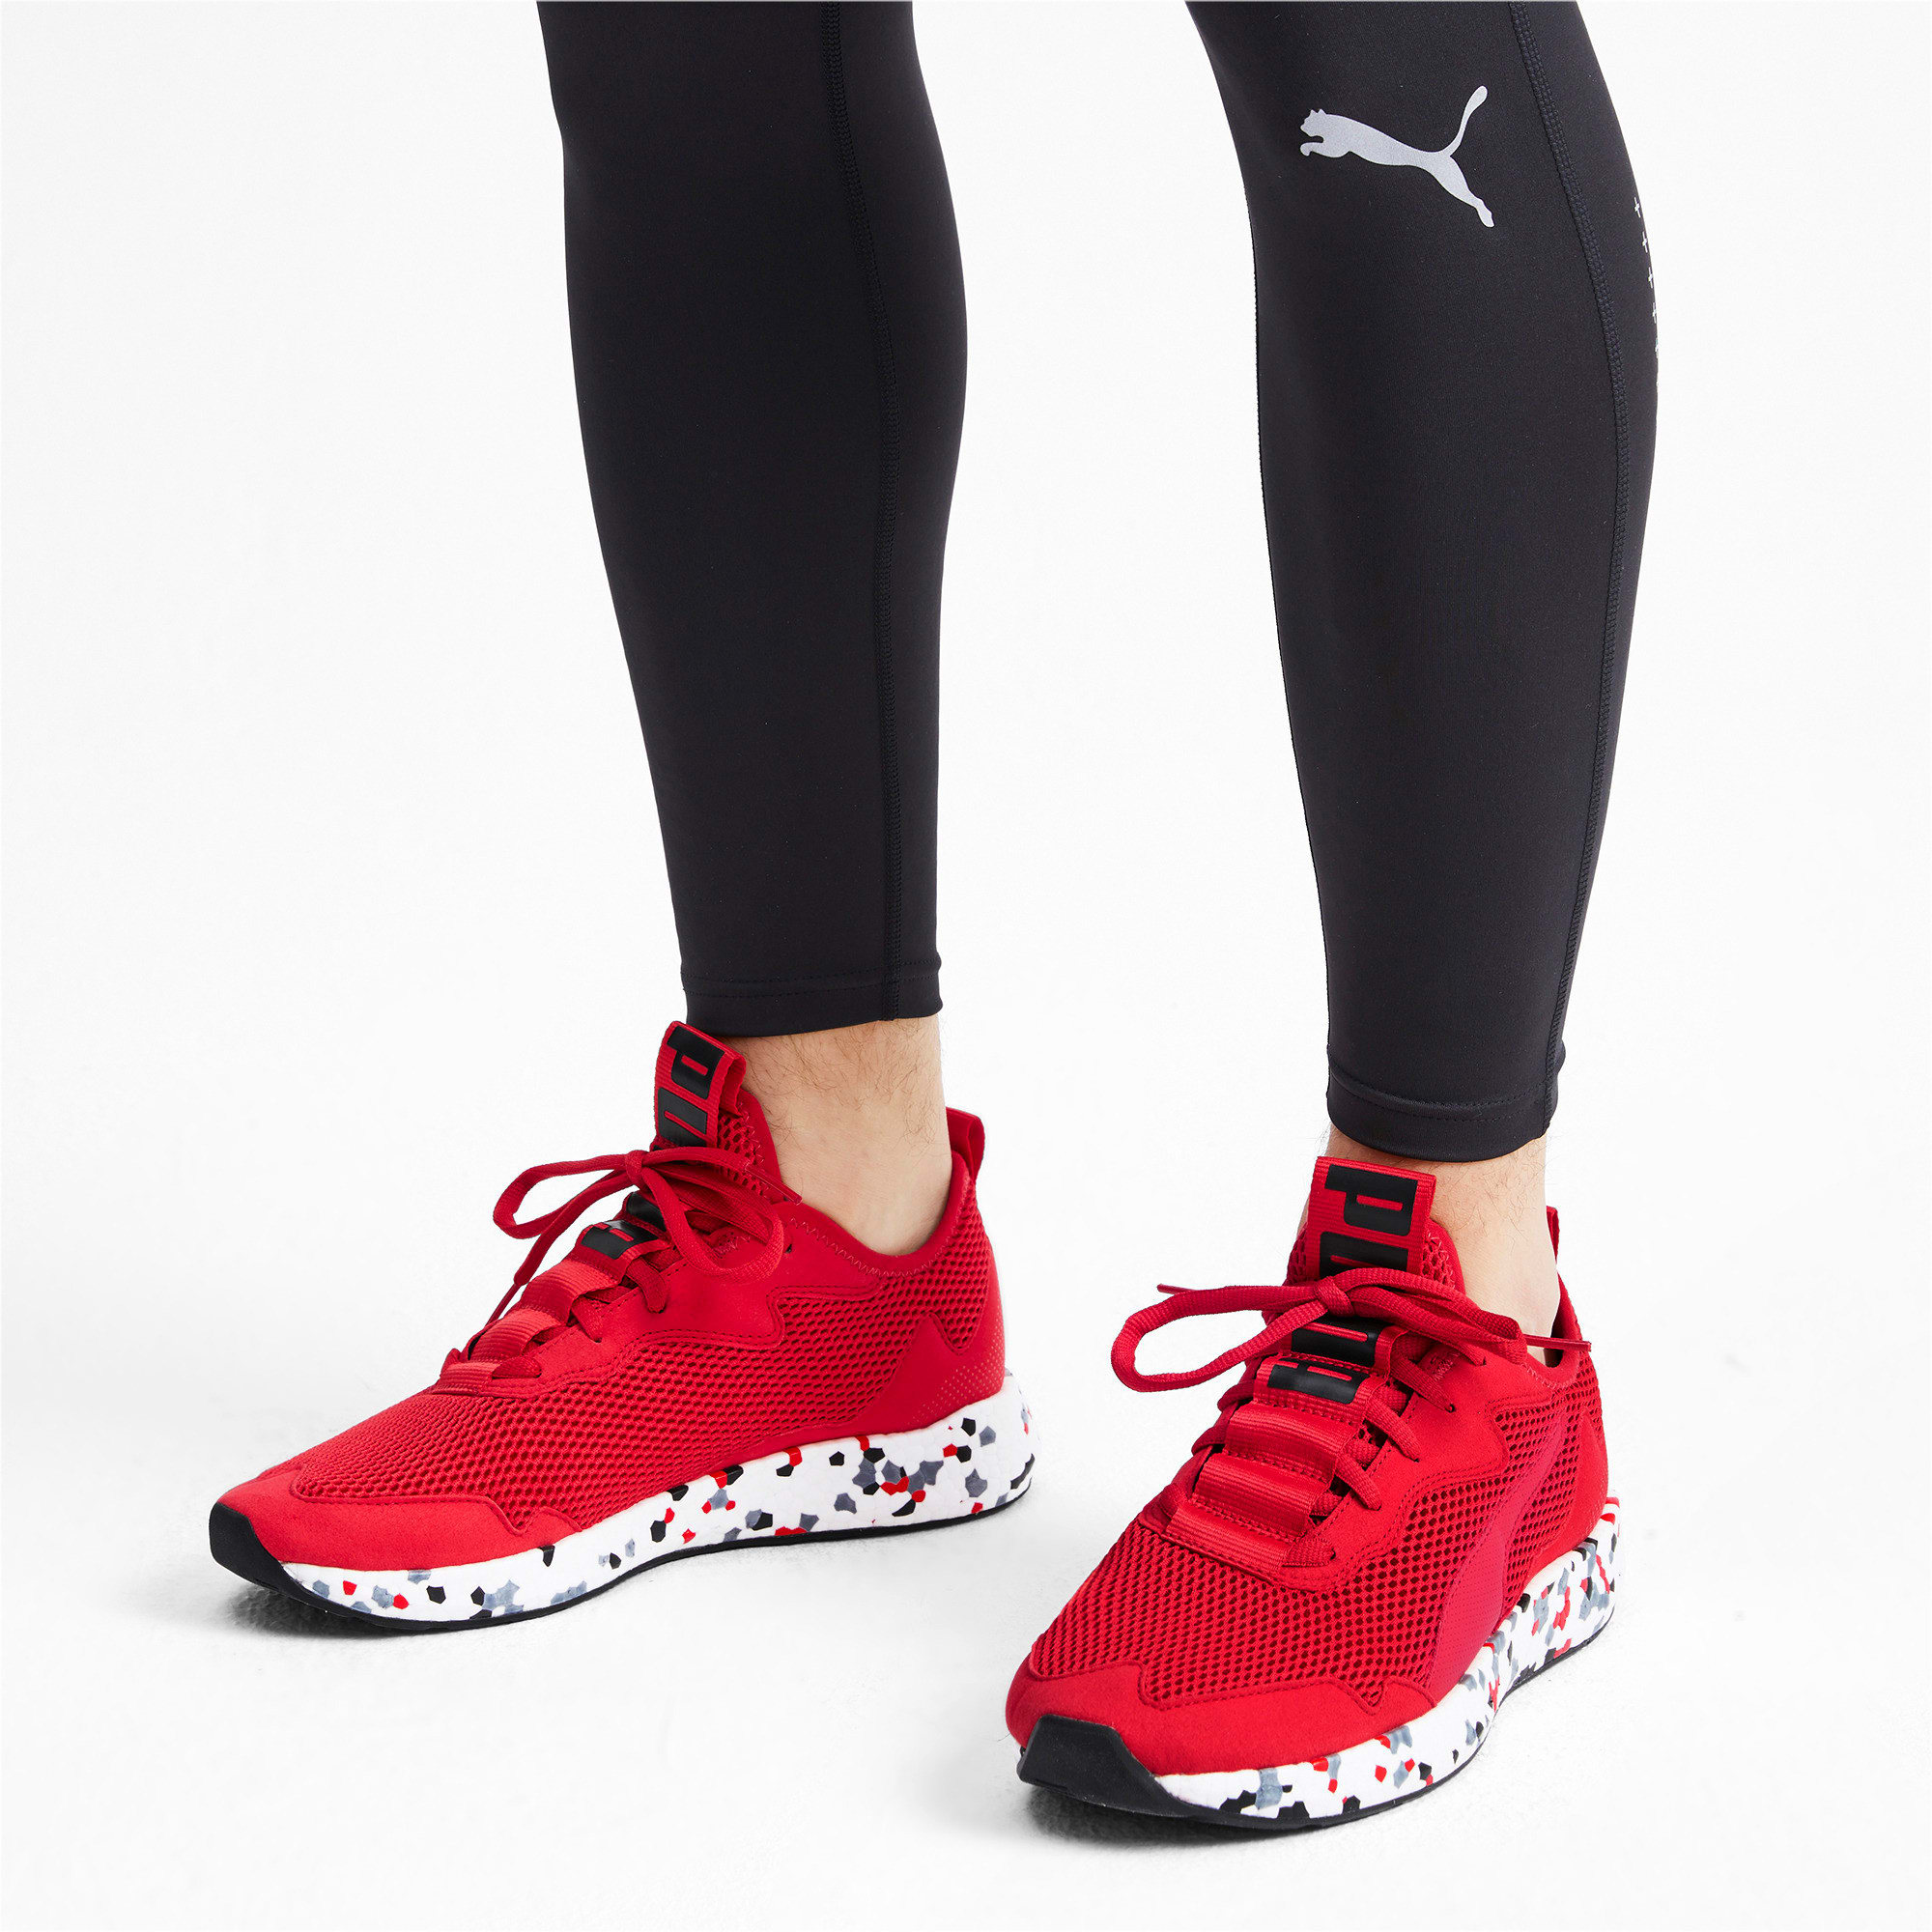 Thumbnail 3 of NRGY Neko Skim Men's Running Shoes, High Risk Red-Puma Black, medium-IND